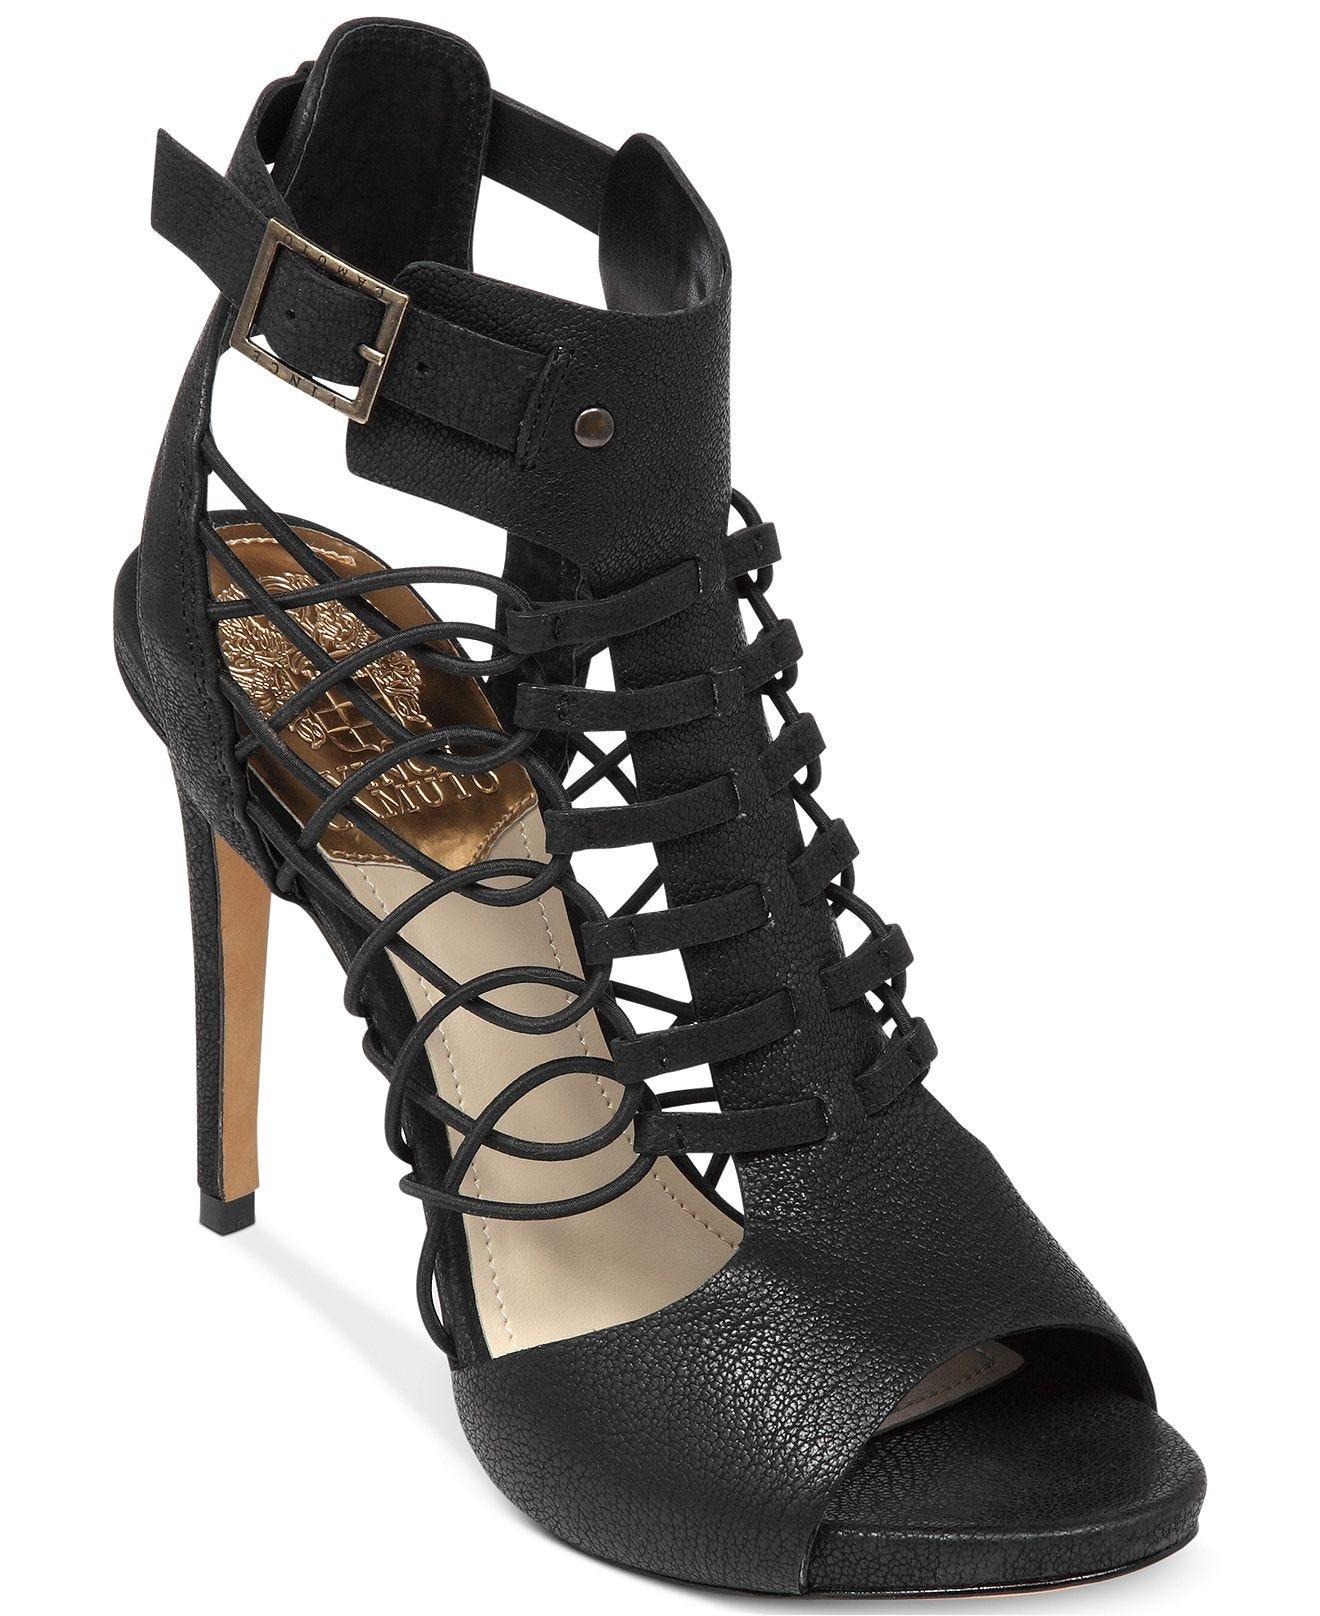 5b8eca16438f Extended Sizes Trendy Footwear — Plus Style